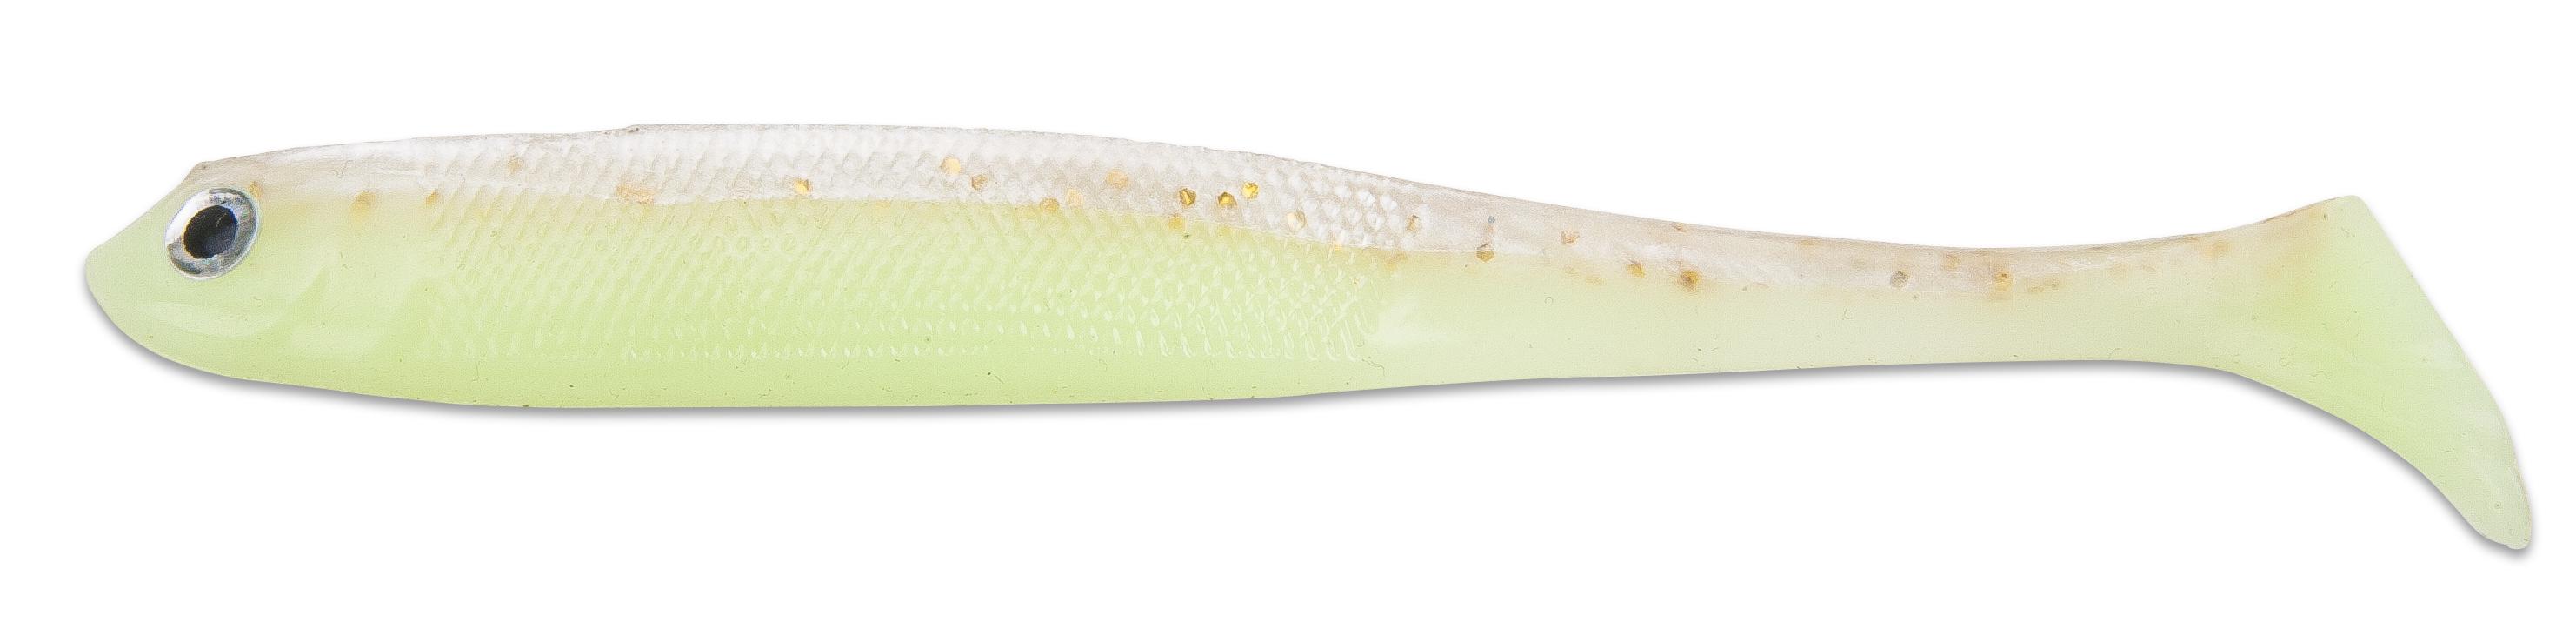 Iron Claw gumová nástraha Slim Jim 10 cm Vzor LU, 3ks